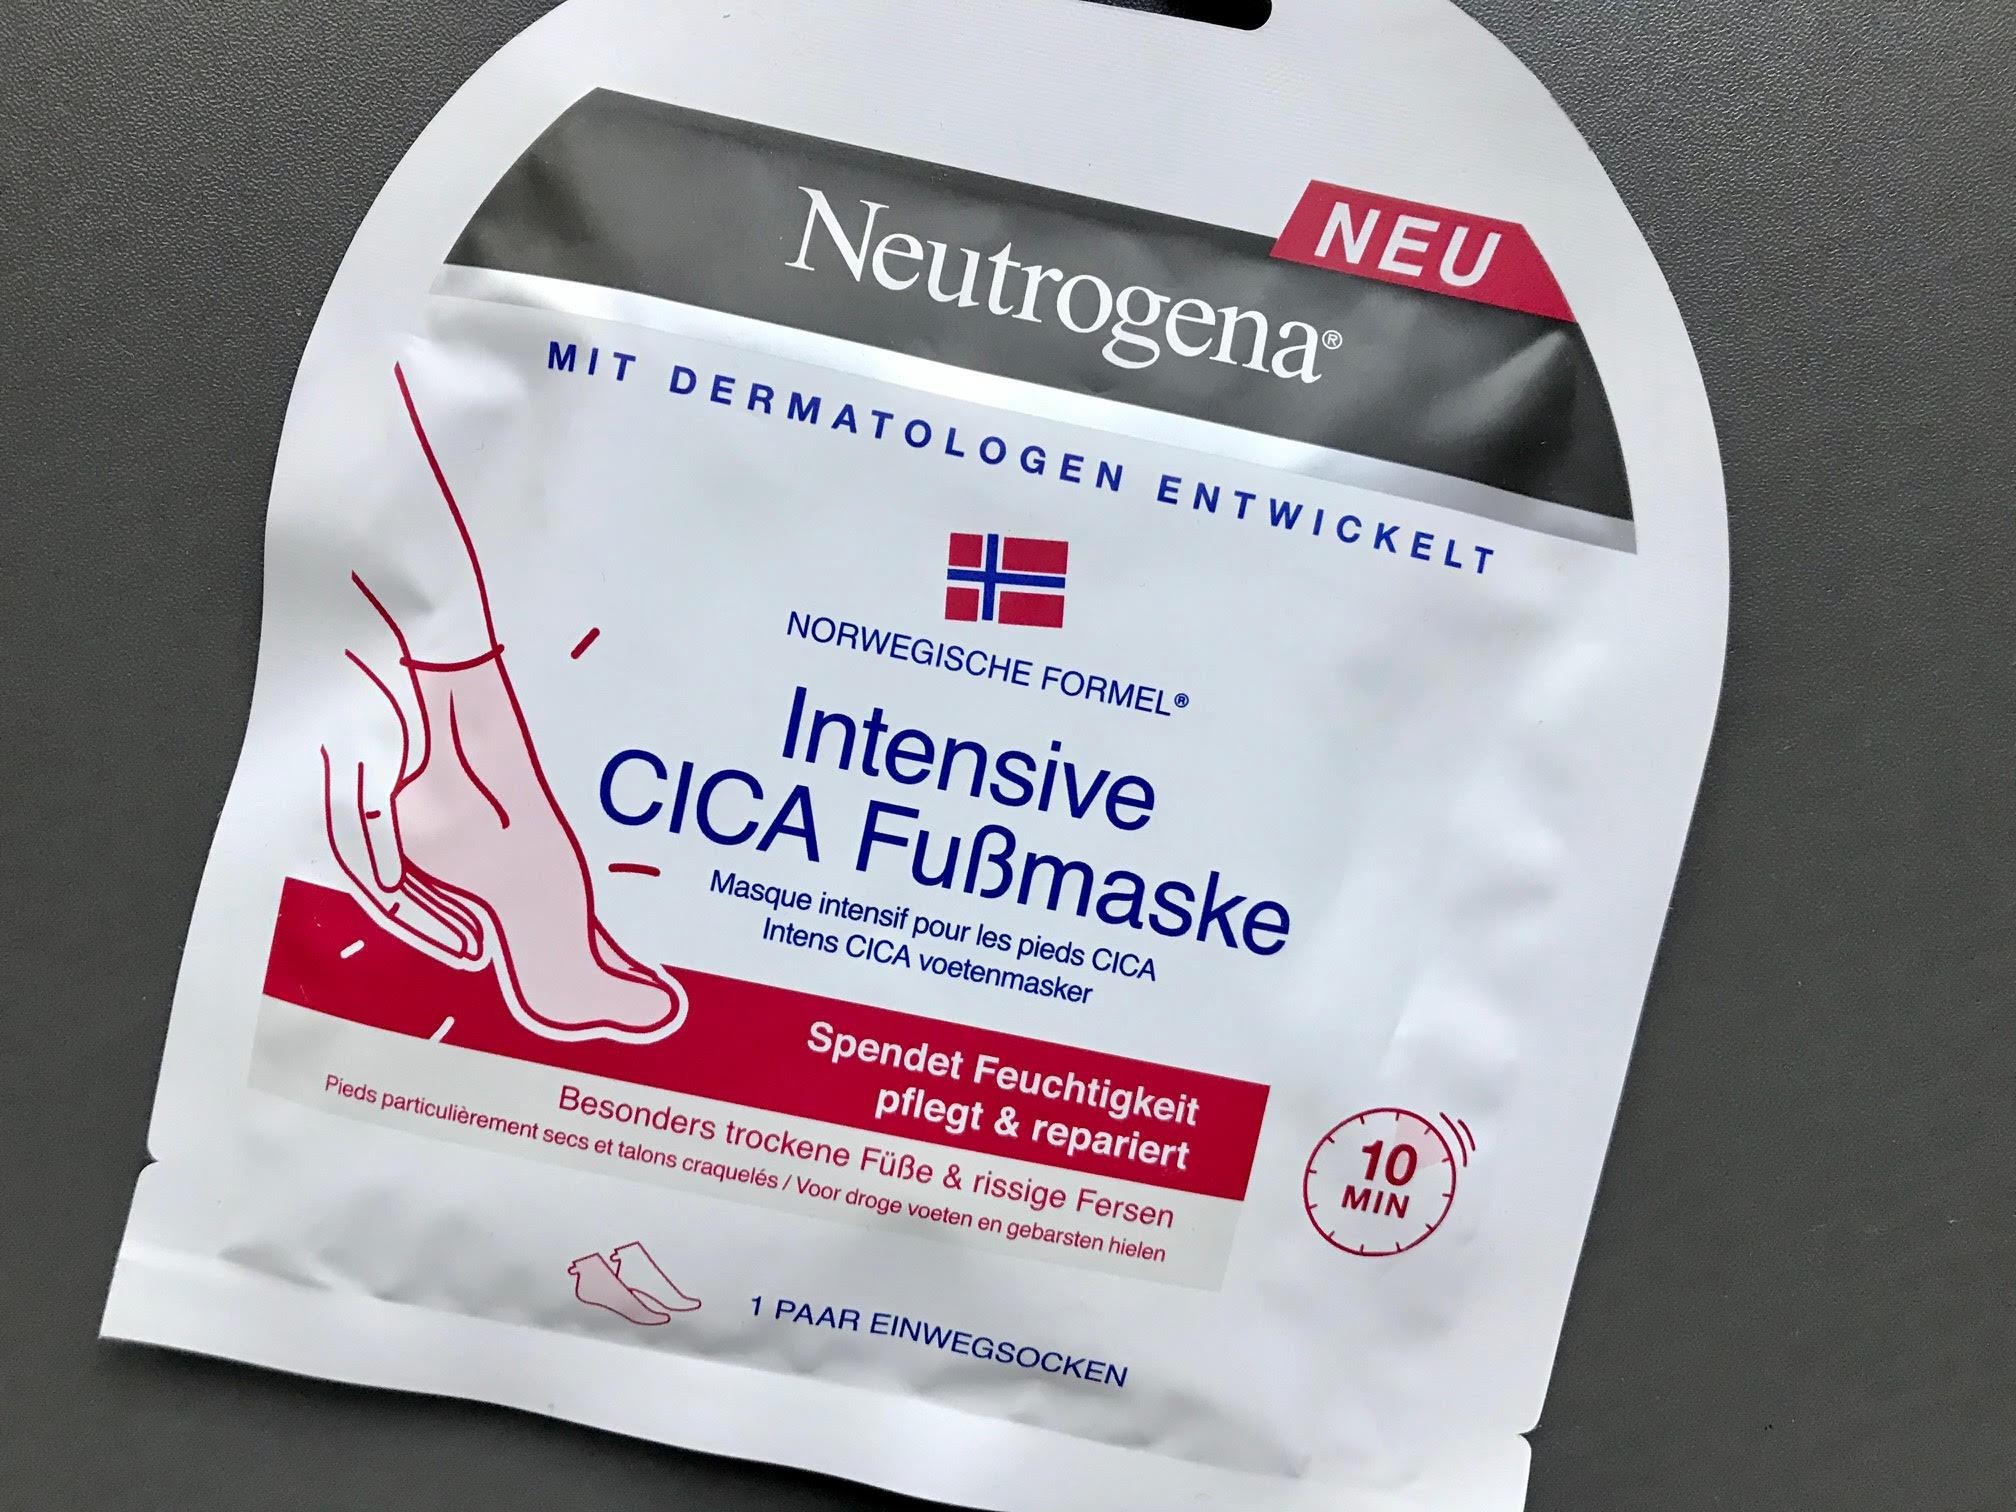 neutrogena voetenmasker